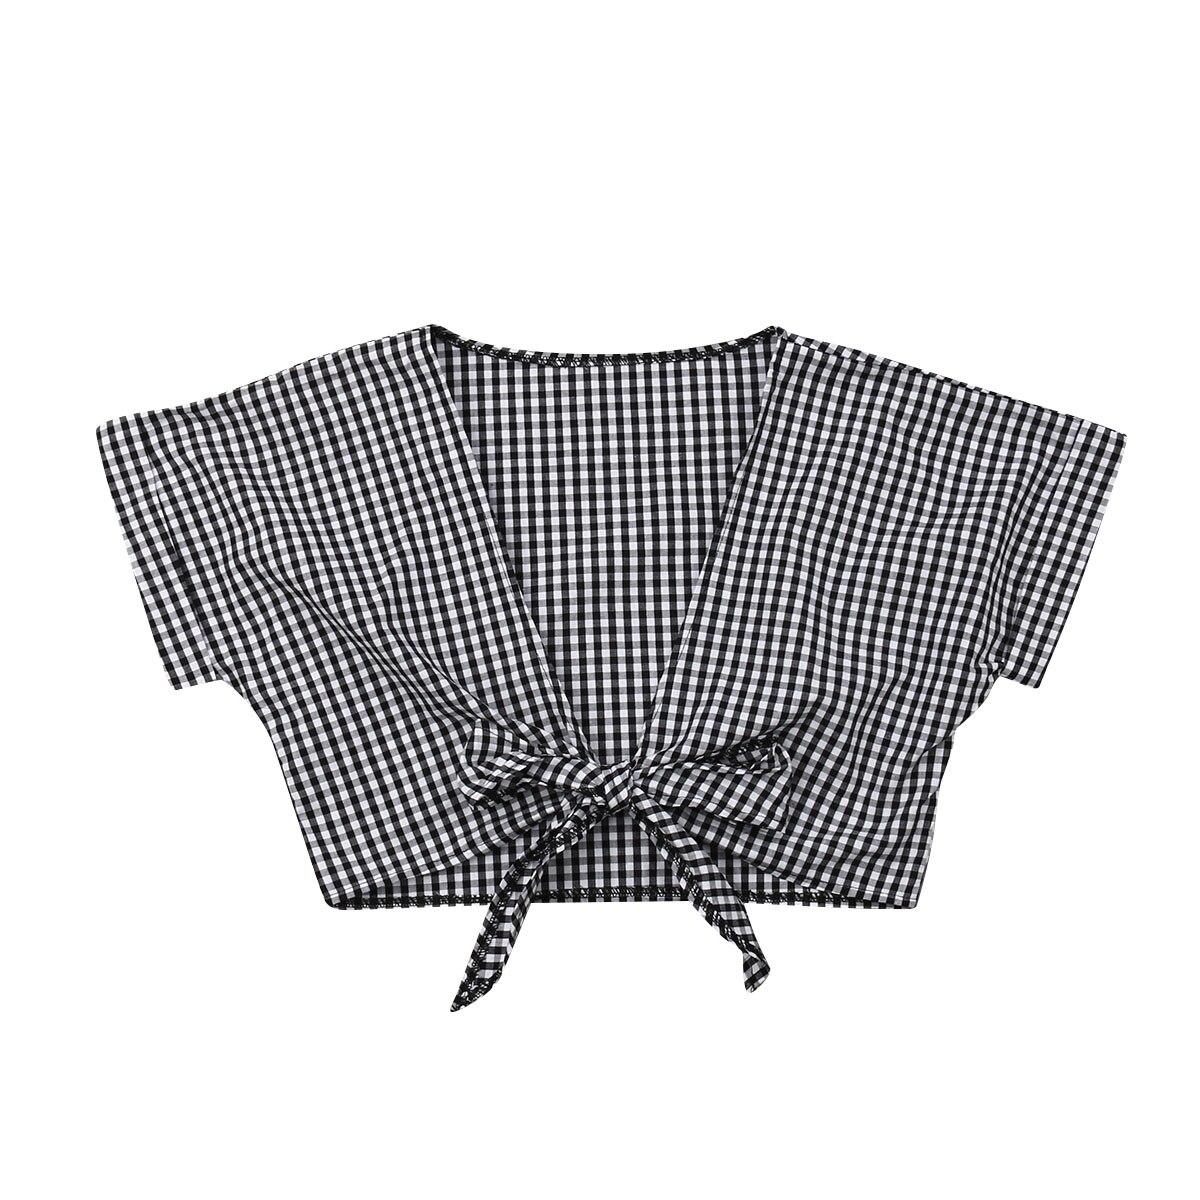 Blouses & Shirts Responsible 2019 Women Fashion Plaids V-neck Short Blouse Lady Girls Casual Top Blouses Ladies Slim Crop Tops Shirts